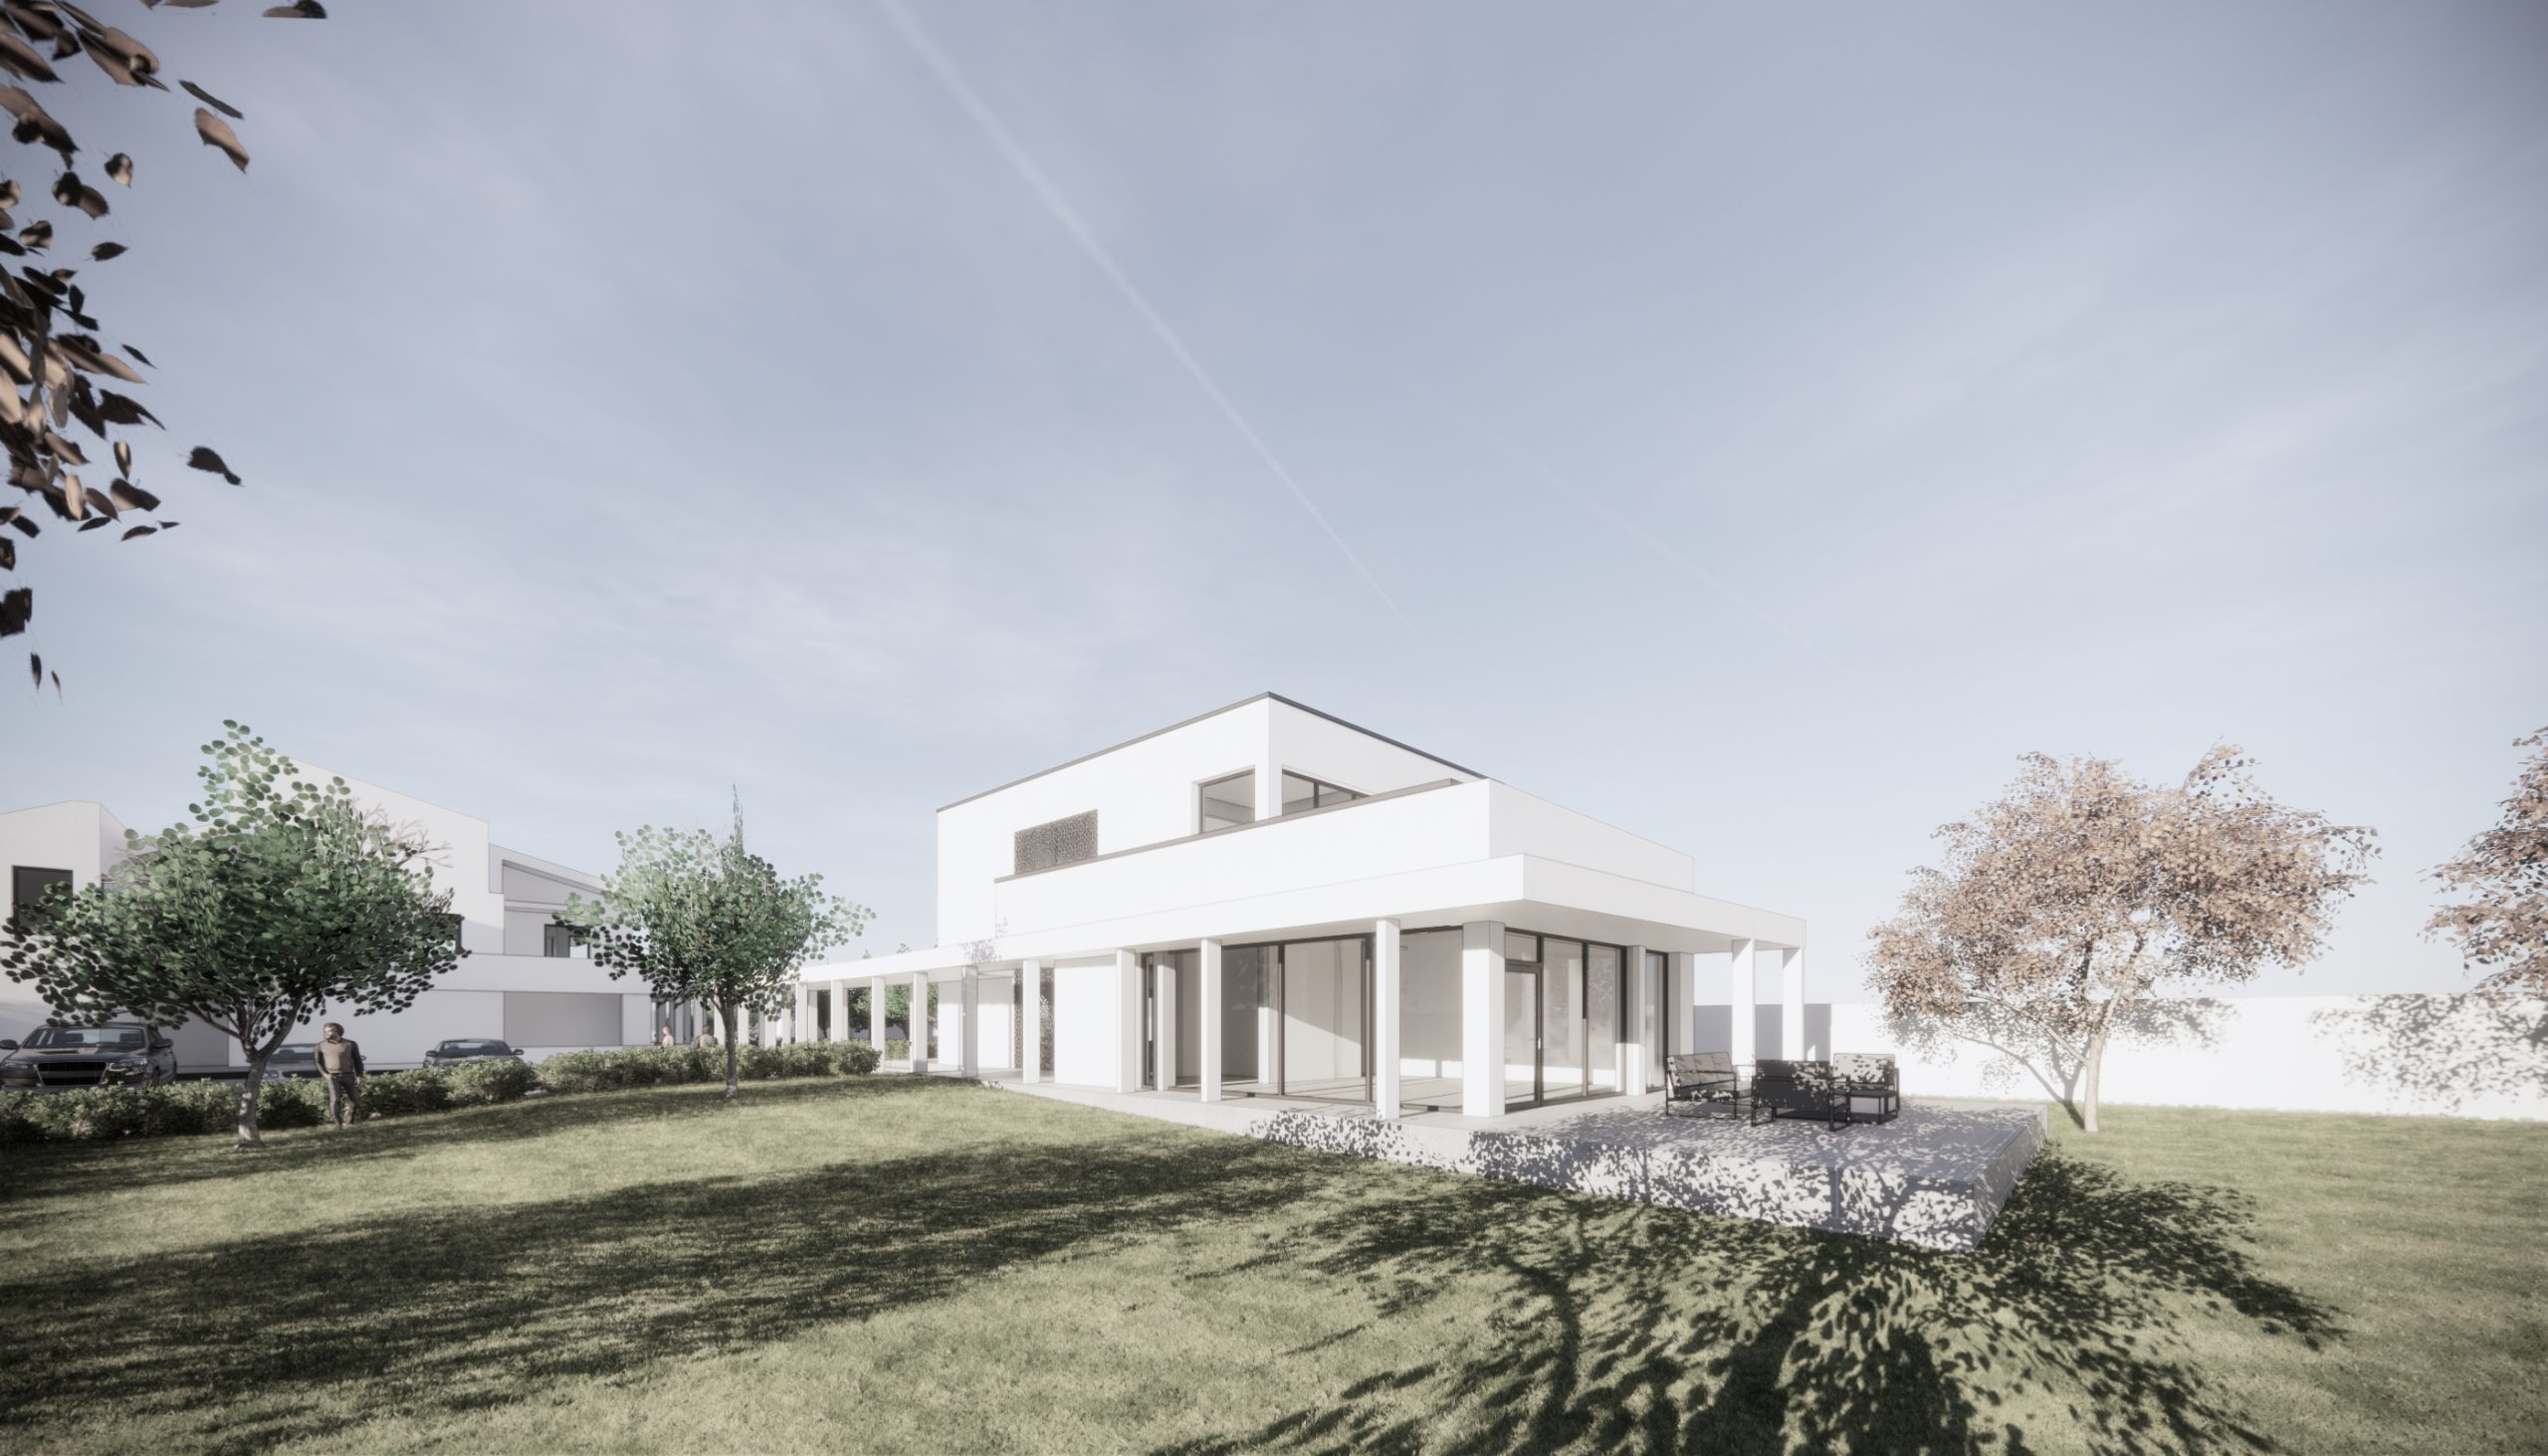 https://nbc-arhitect.ro/wp-content/uploads/2020/11/NBC-Arhitect-_-residential-_-2x-Snagov-_-Snagov-Romania_16-scaled.jpg